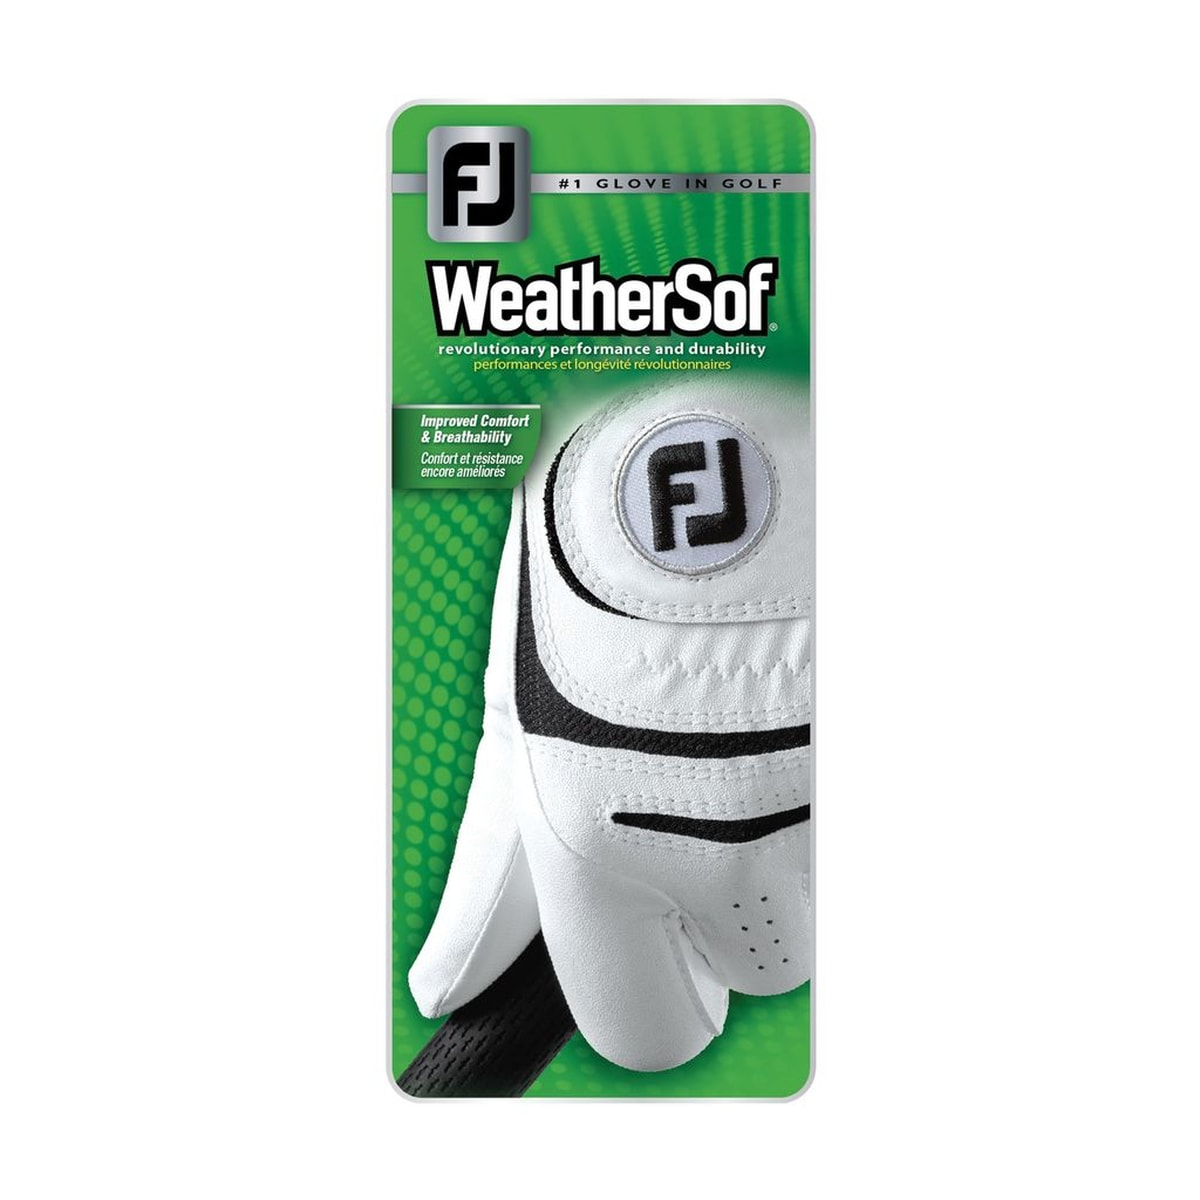 WeatherSof-Prior Generation